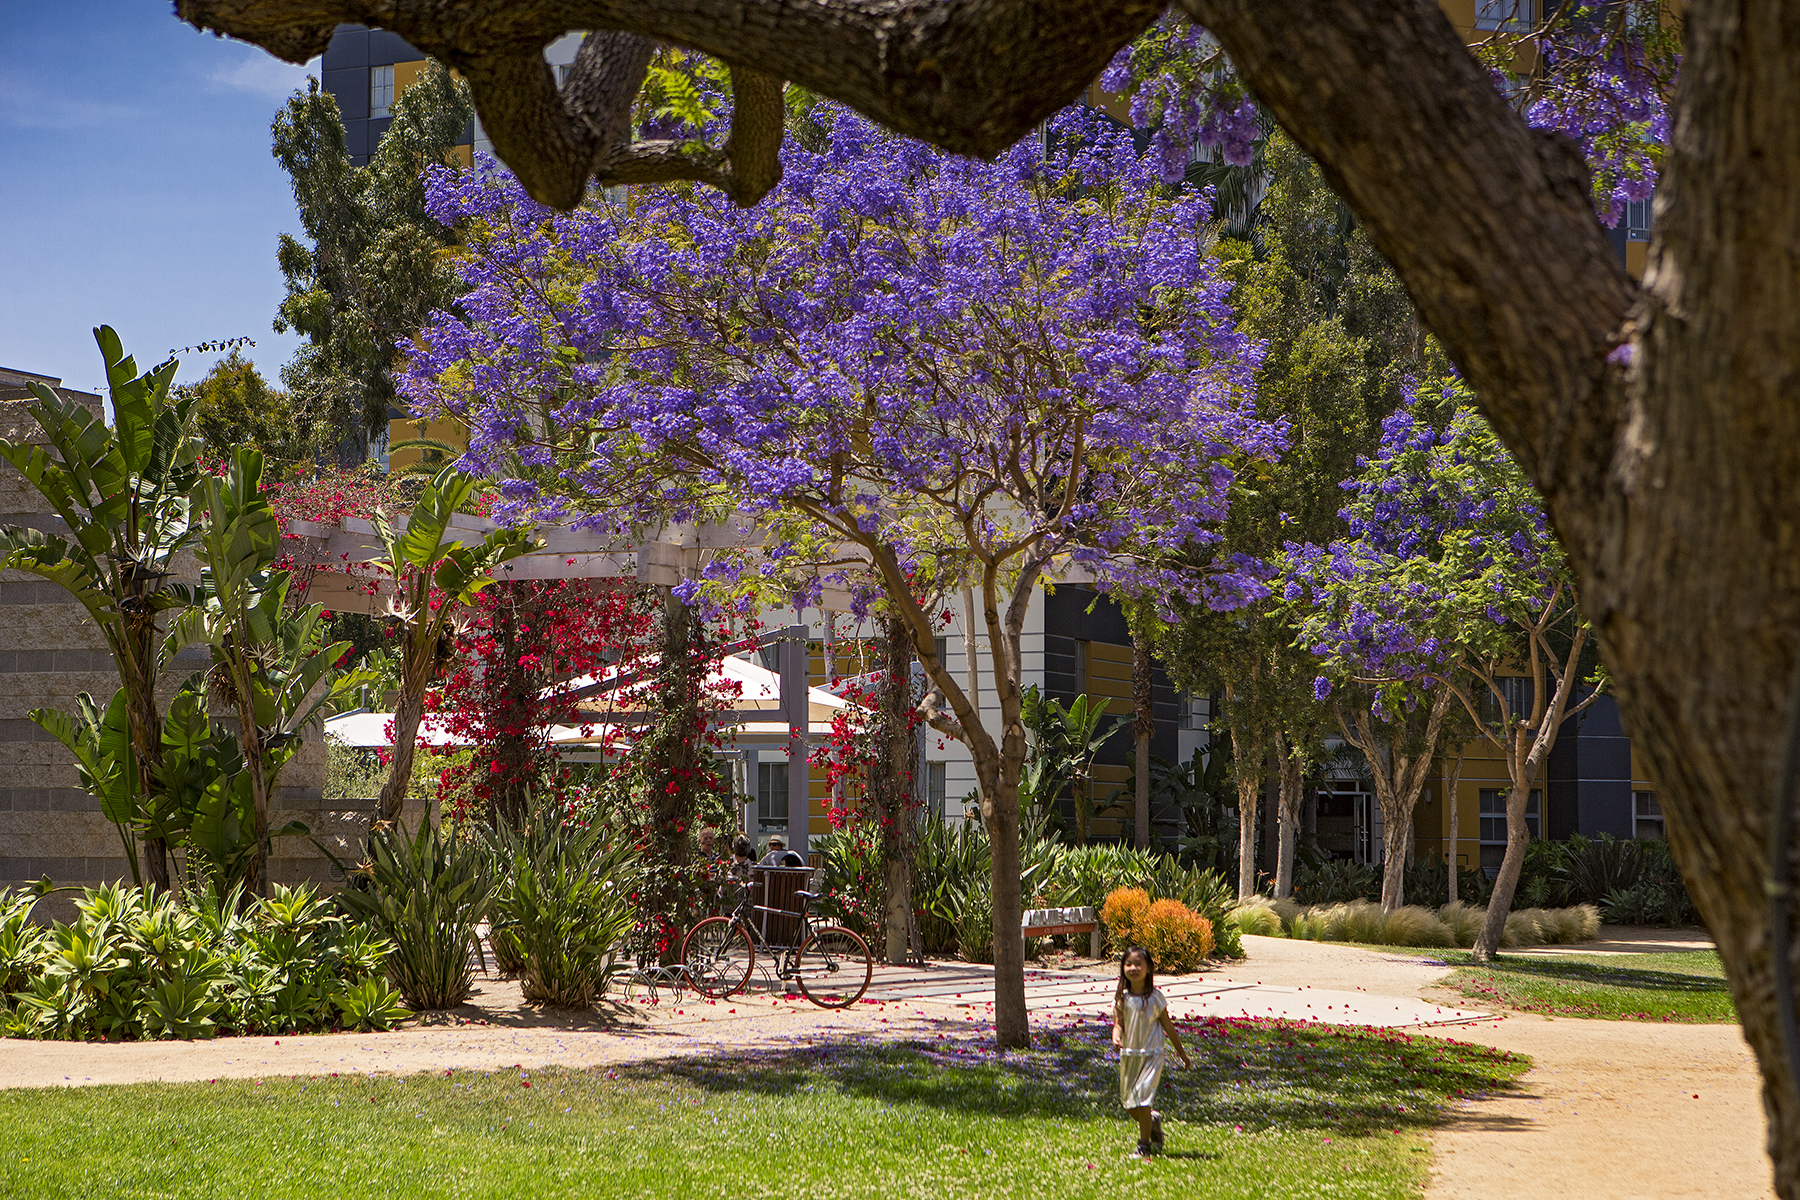 1627-04-Jacaranda-Trees_Park-LaBrea_EricFiggePhotos.jpg